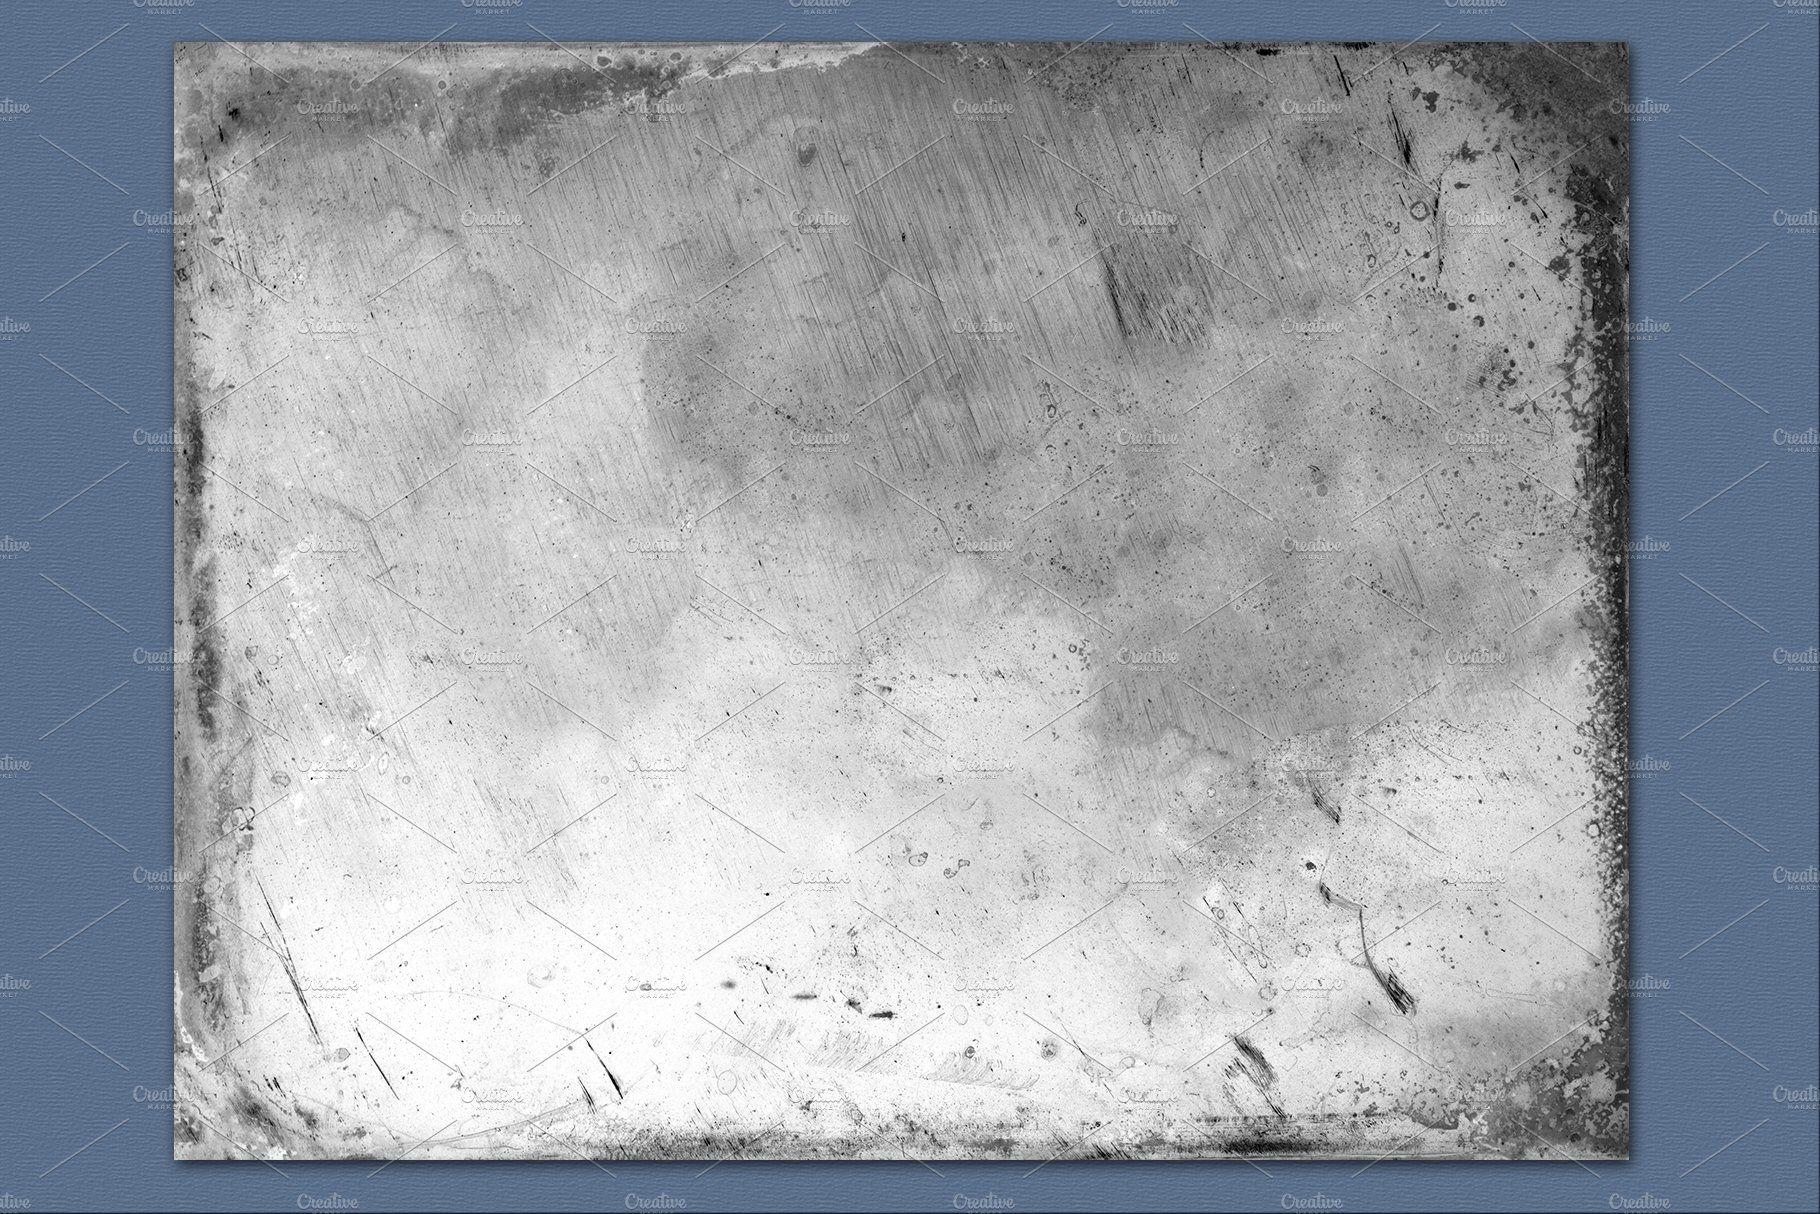 Vintage Distress Texture Overlays Distressed Texture Overlays Vintage